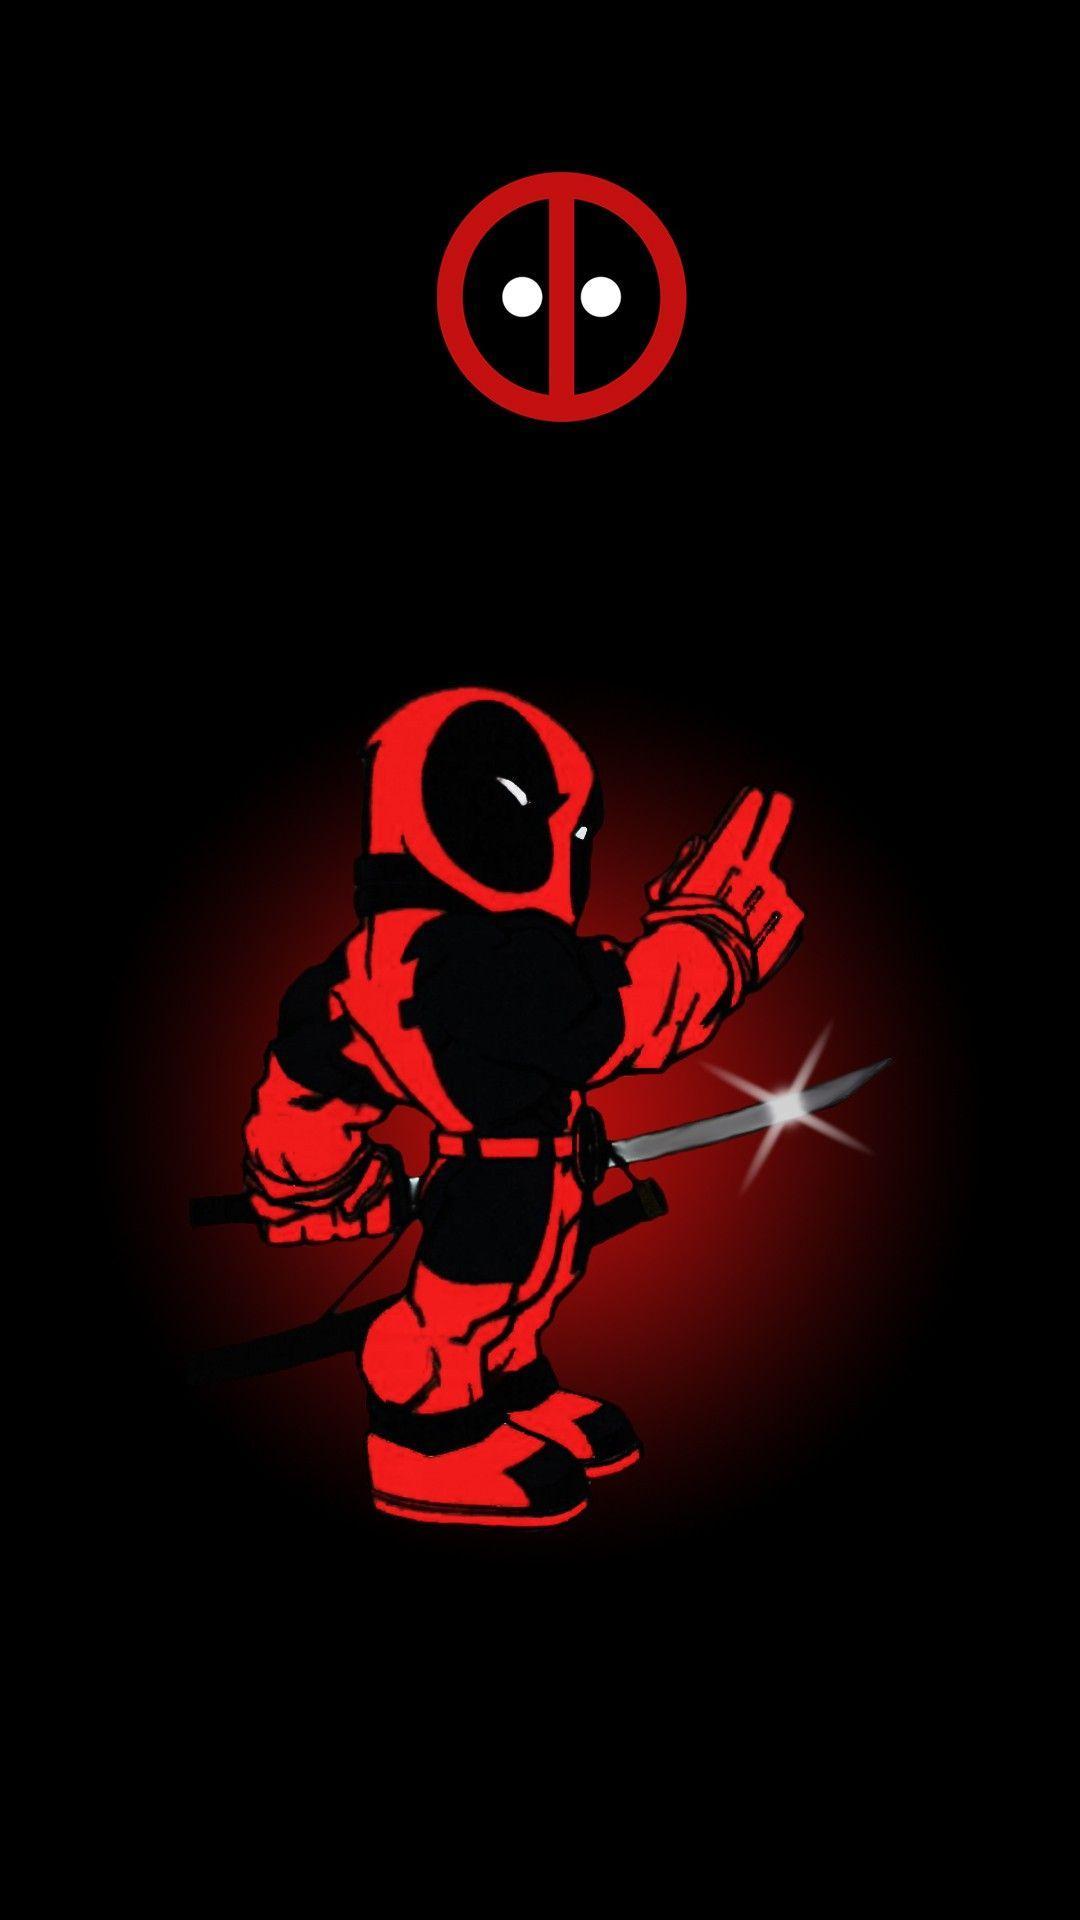 Deadpool Smartphone Wallpapers Top Free Deadpool Smartphone Backgrounds Wallpaperaccess